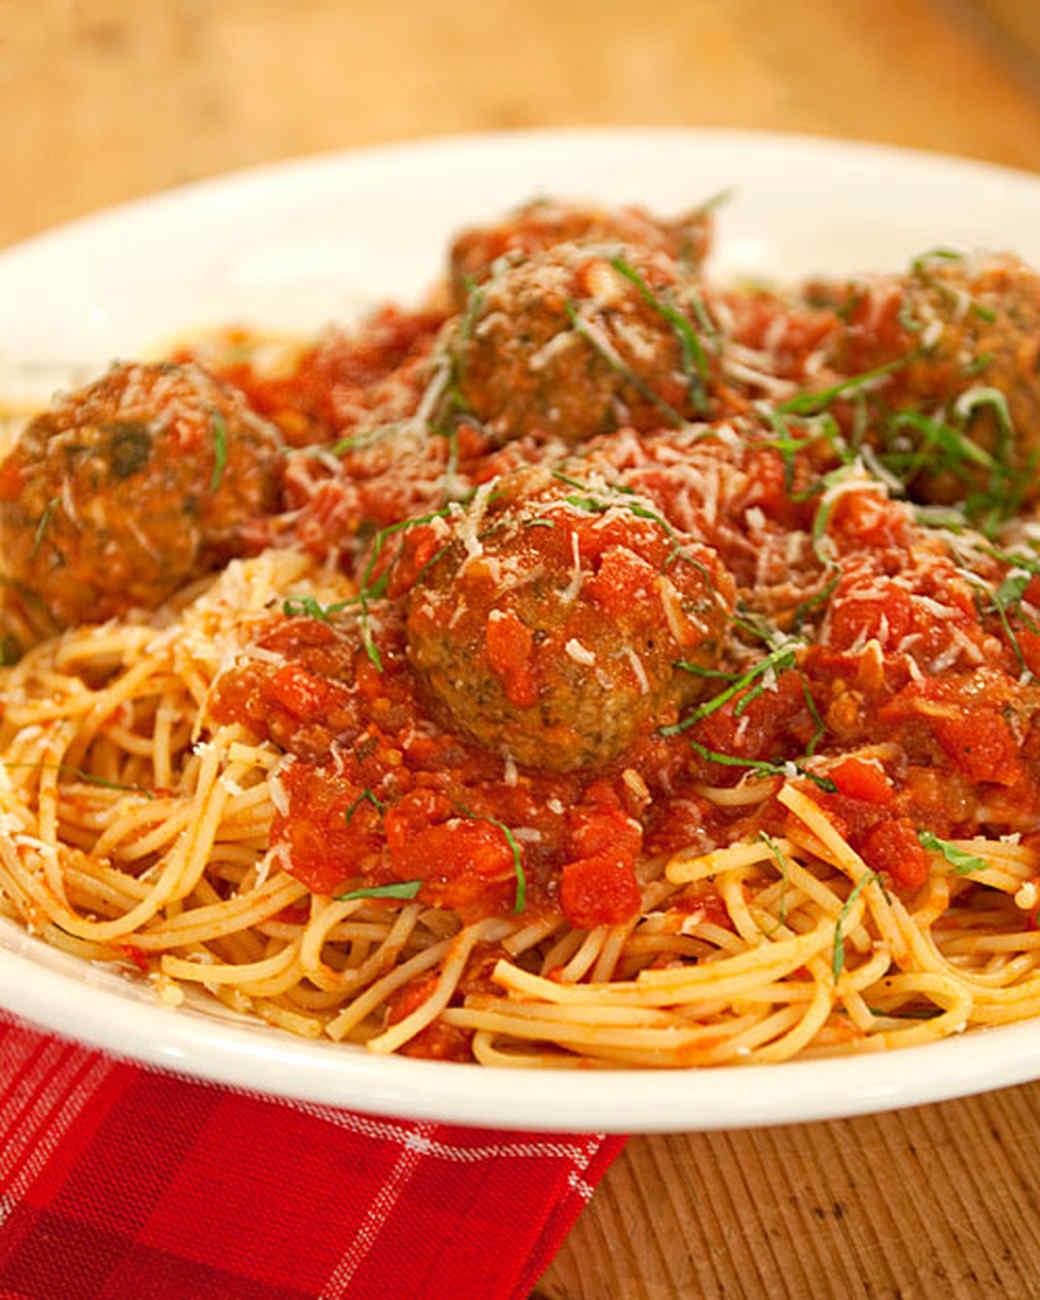 Maroni's Tomato Sauce